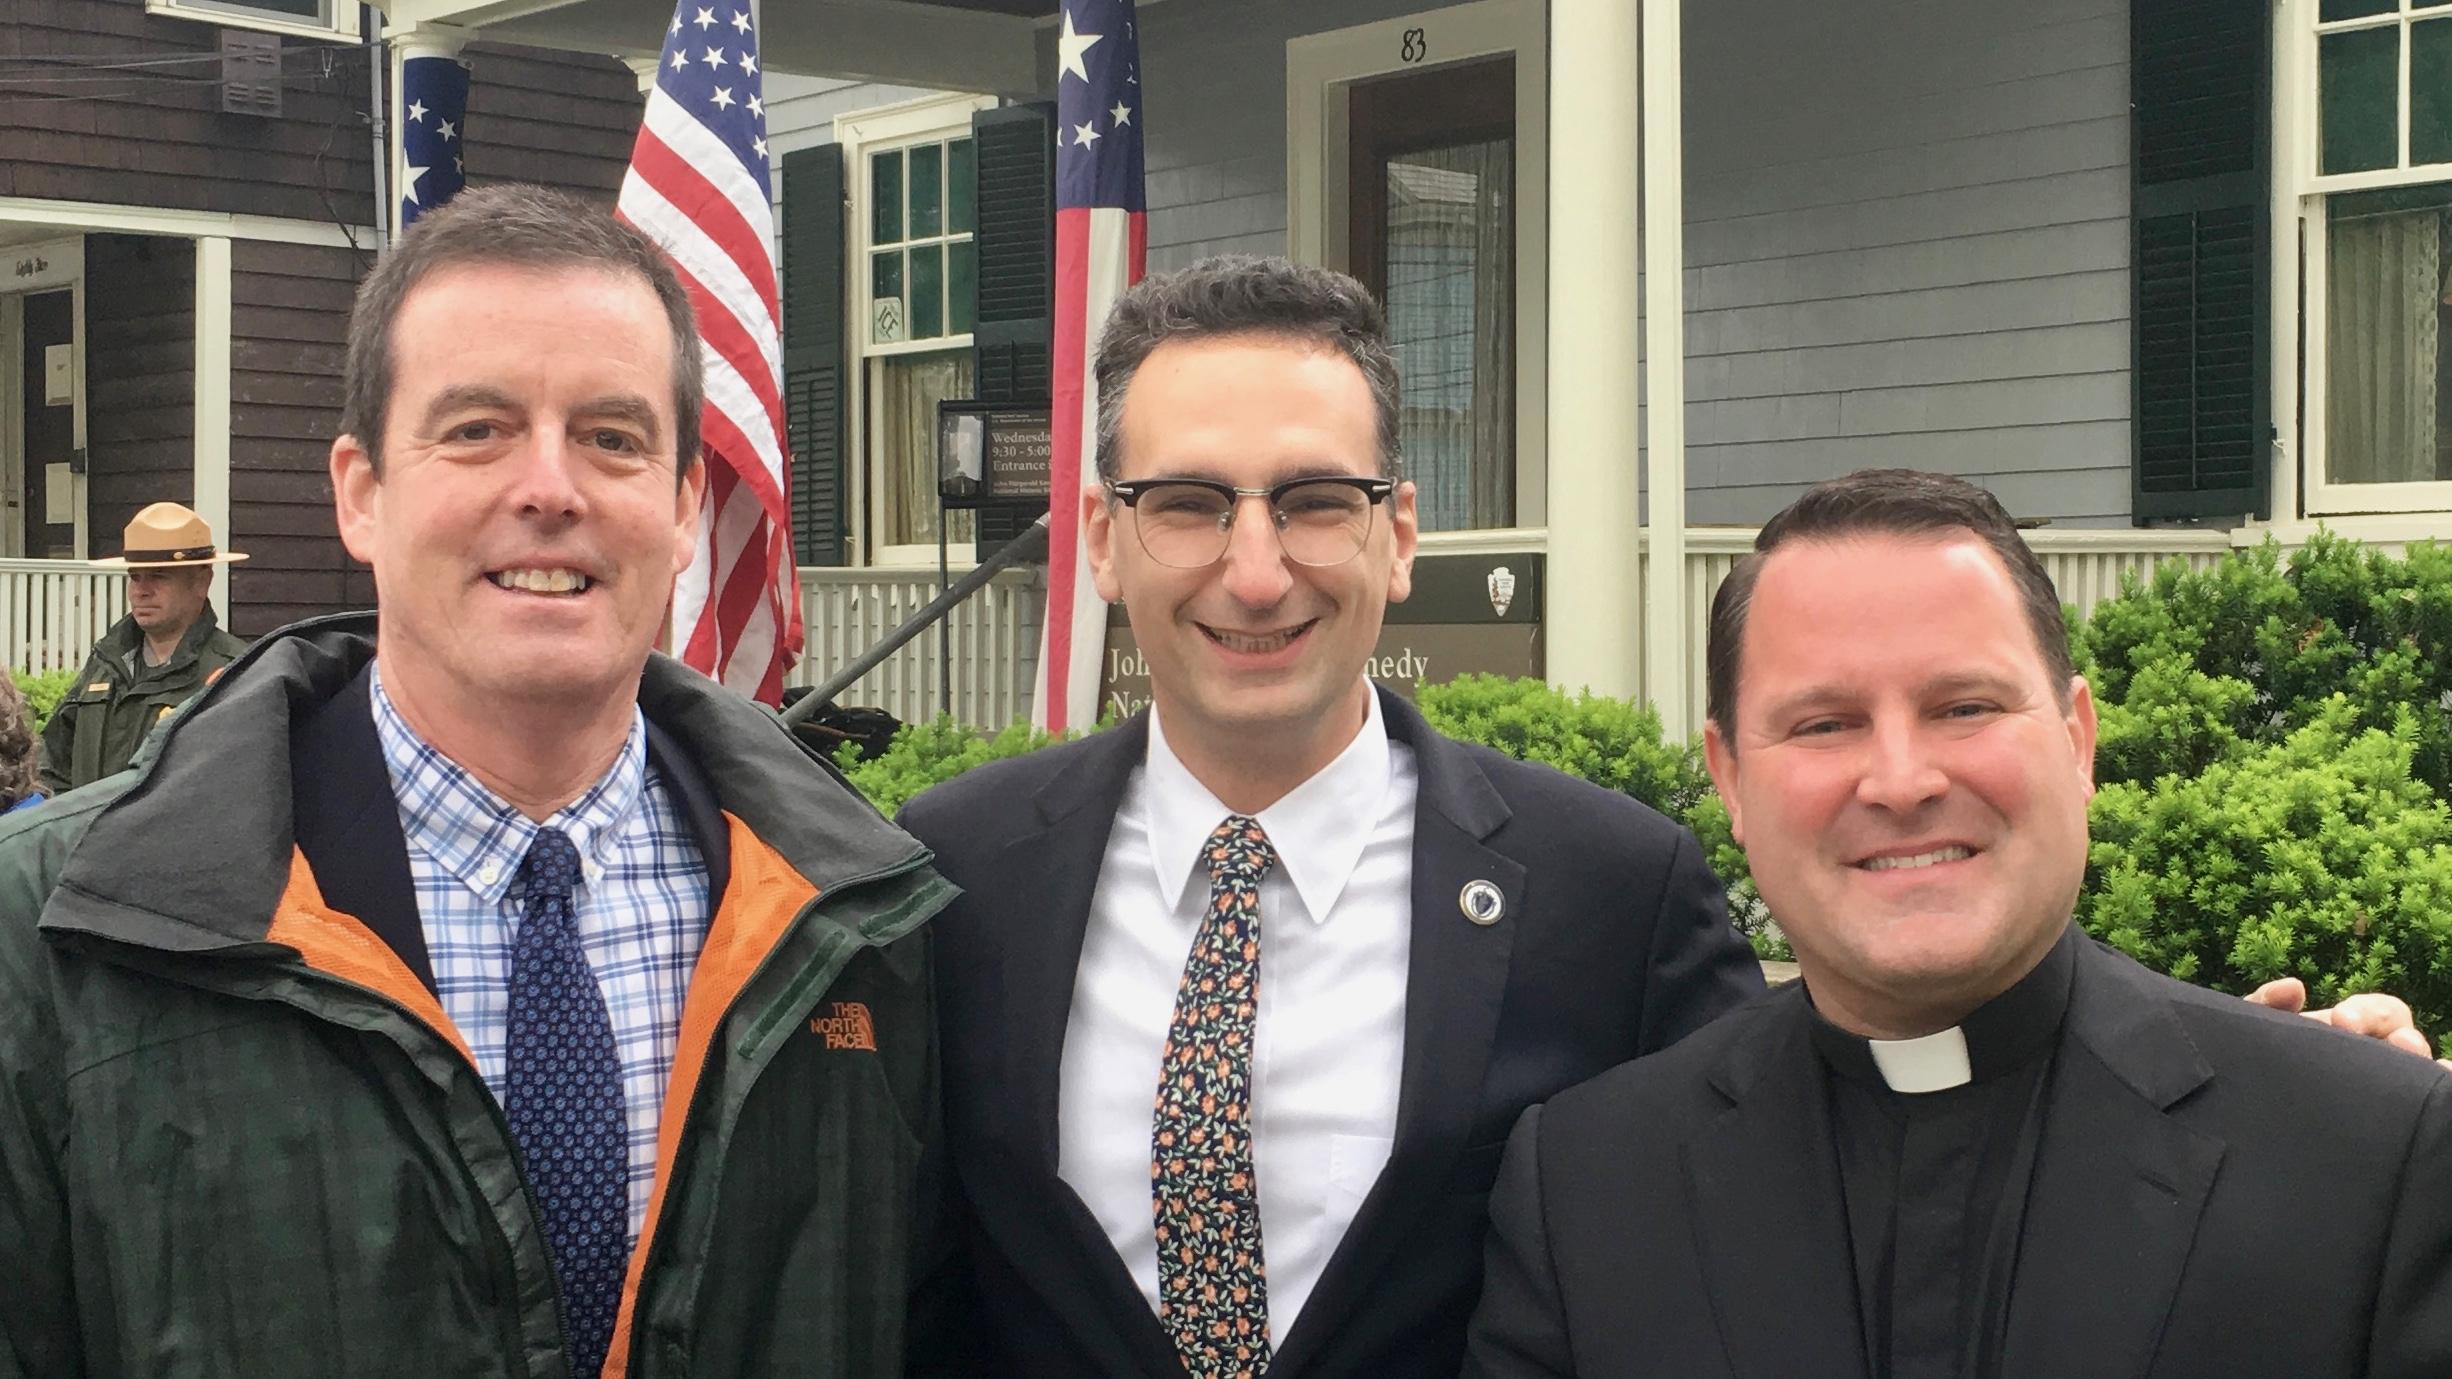 Rabbi Hamilton, Tommy Vitolo, and Father Gaspar at John Kennedy's birthplace